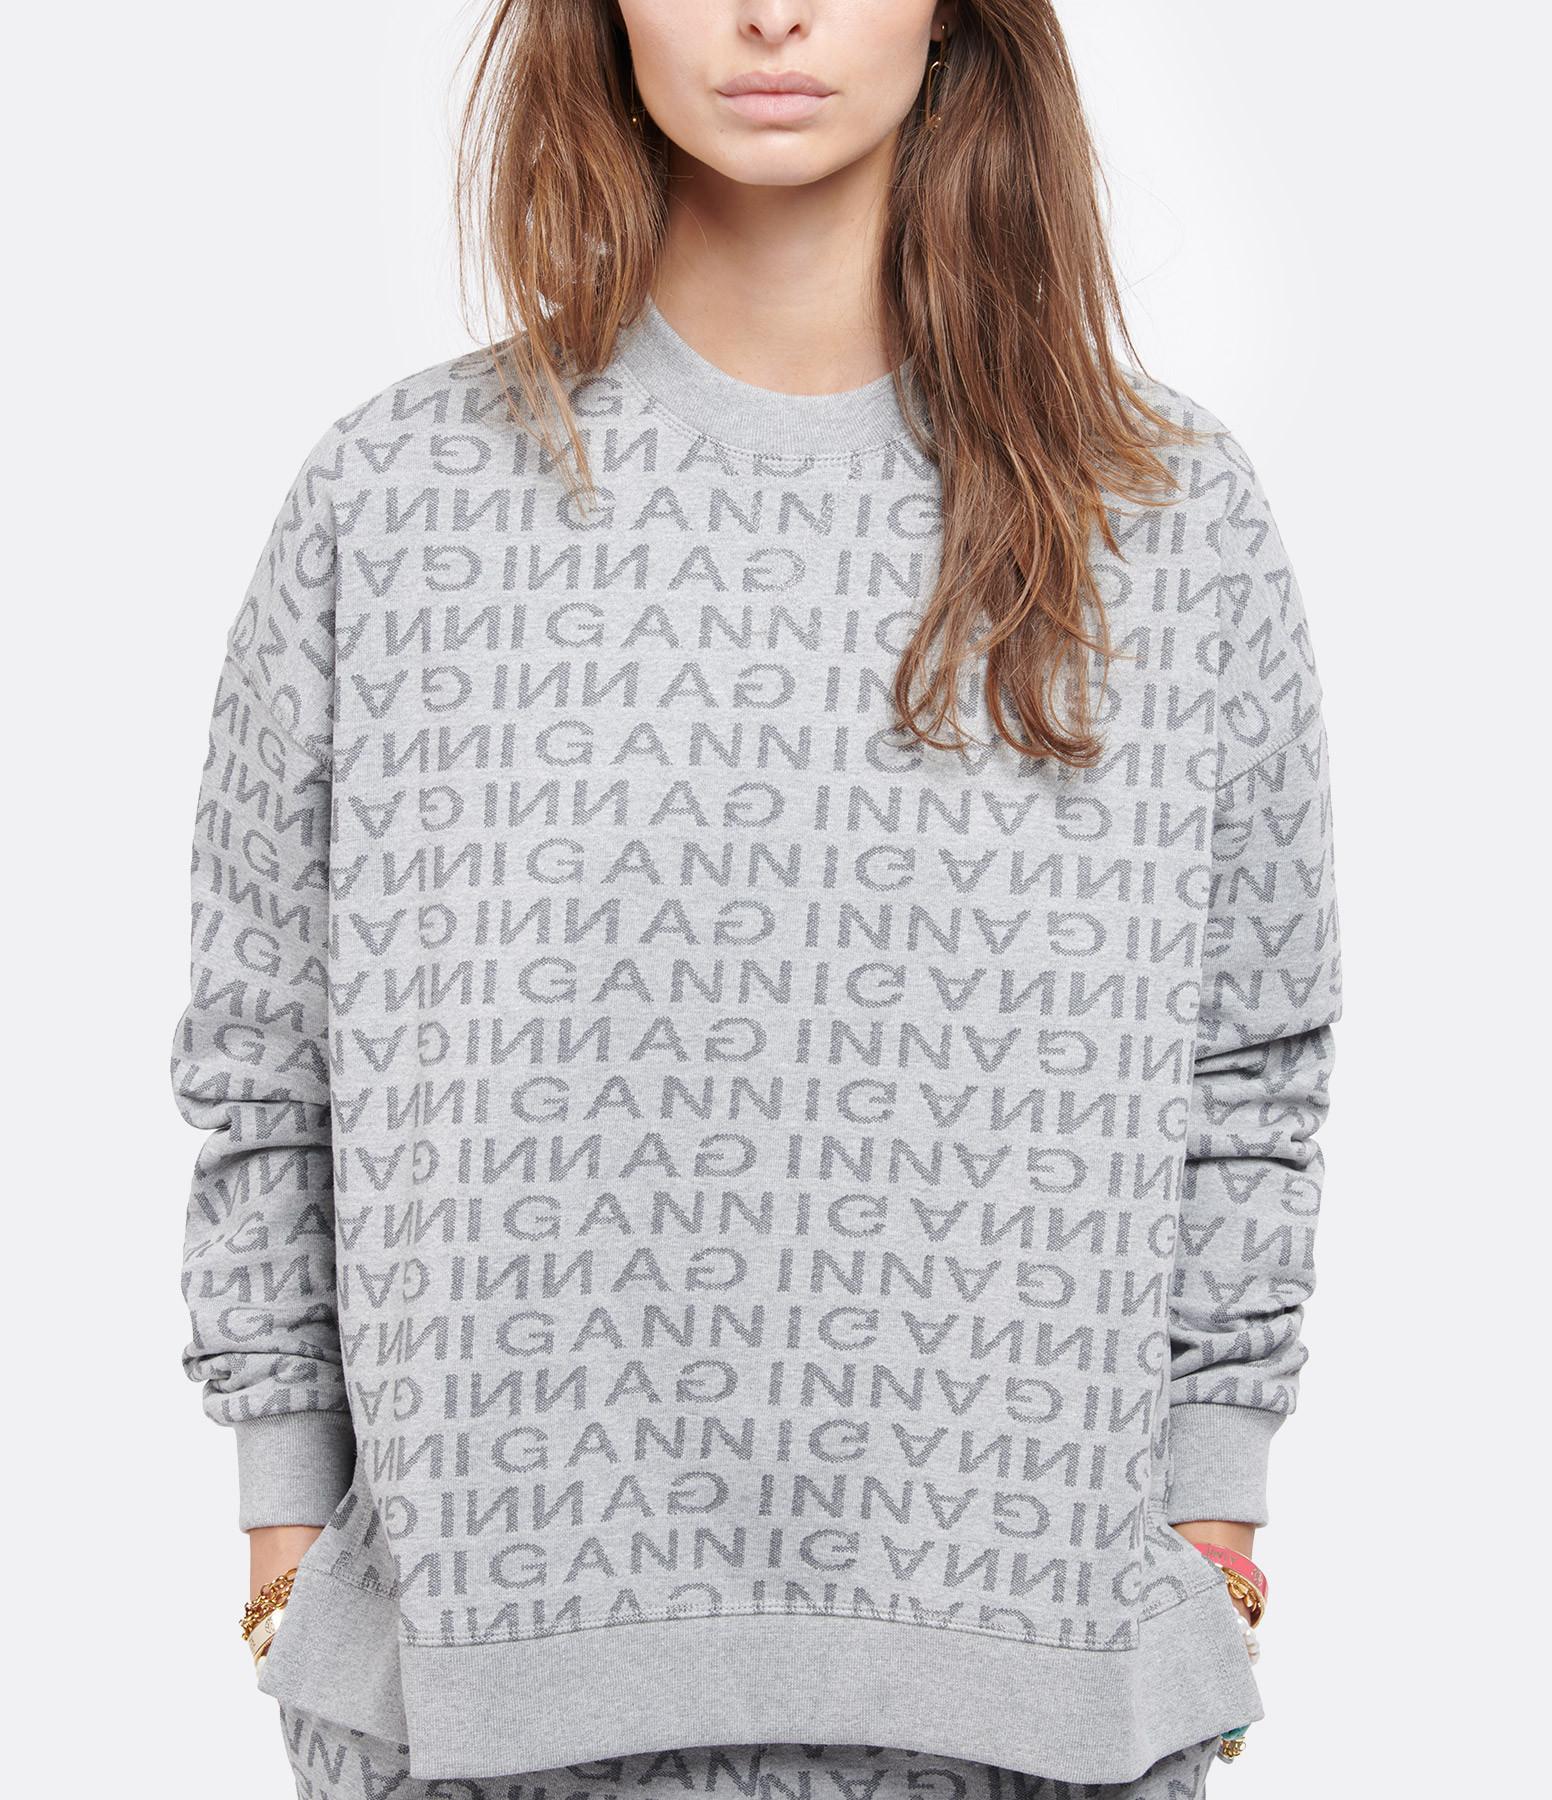 GANNI - Sweatshirt Jacquard Gris